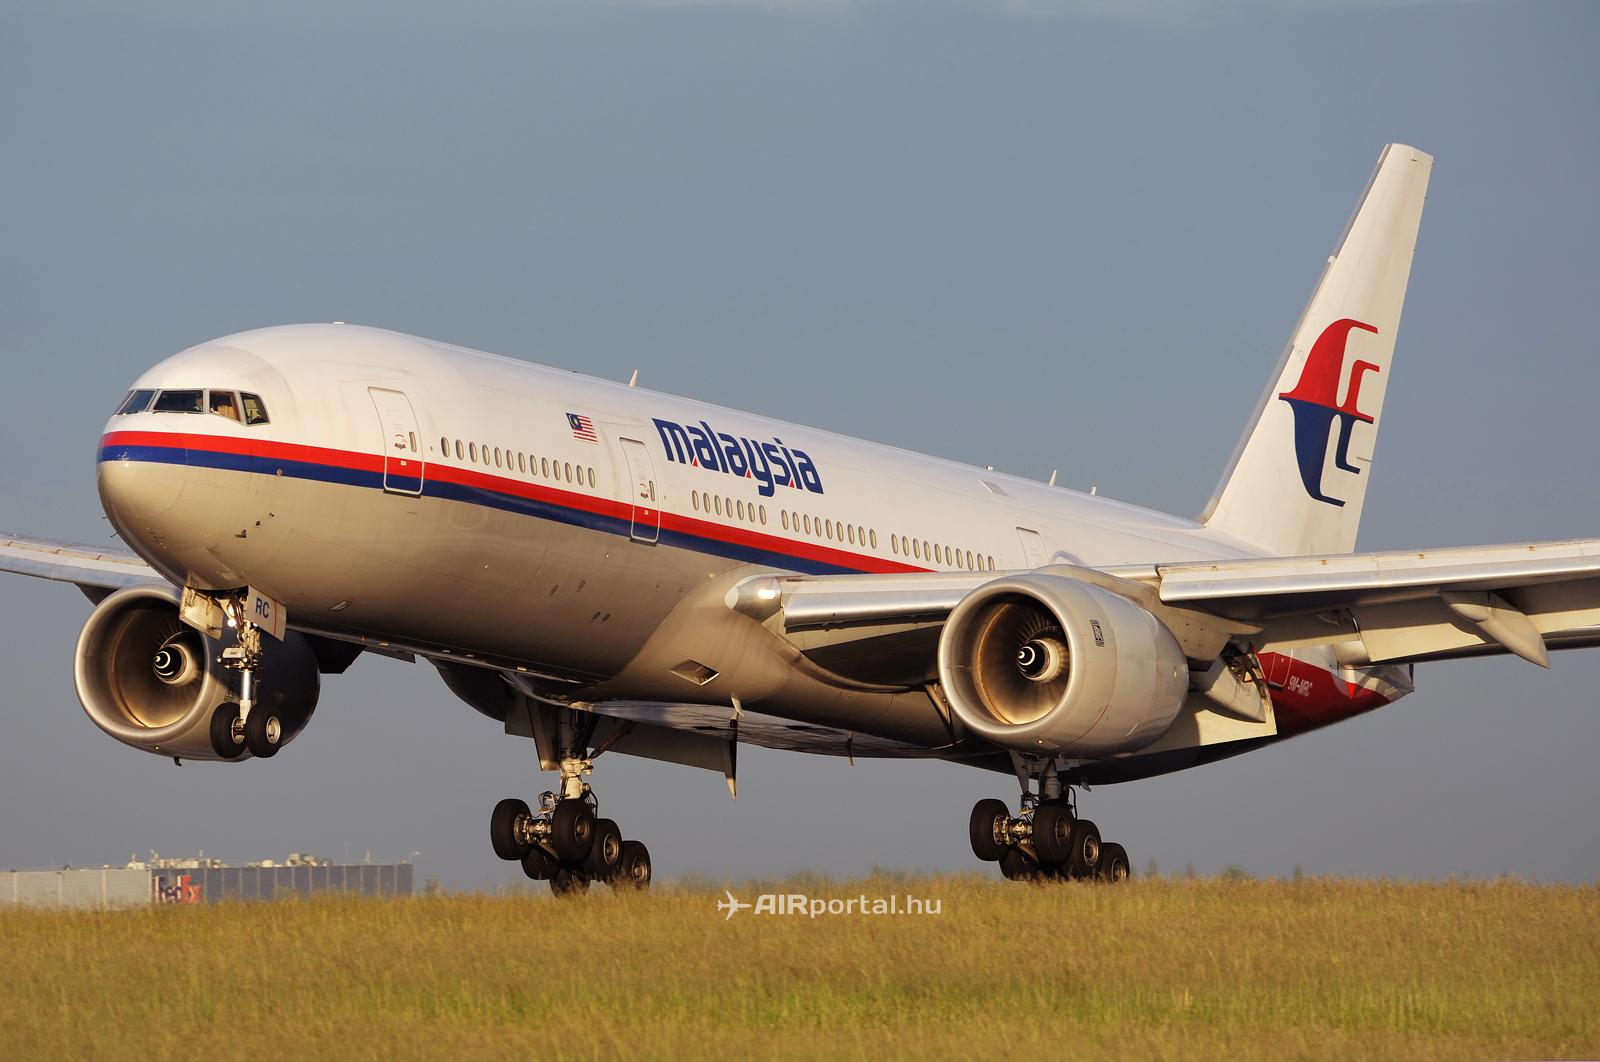 A Malaysia Airlines Boeing 777-200ER típusú repülőgépe a párizsi Charles de Gaulle repülőterén. (Fotó: Kovács Gábor - AIRportal.hu) | © AIRportal.hu